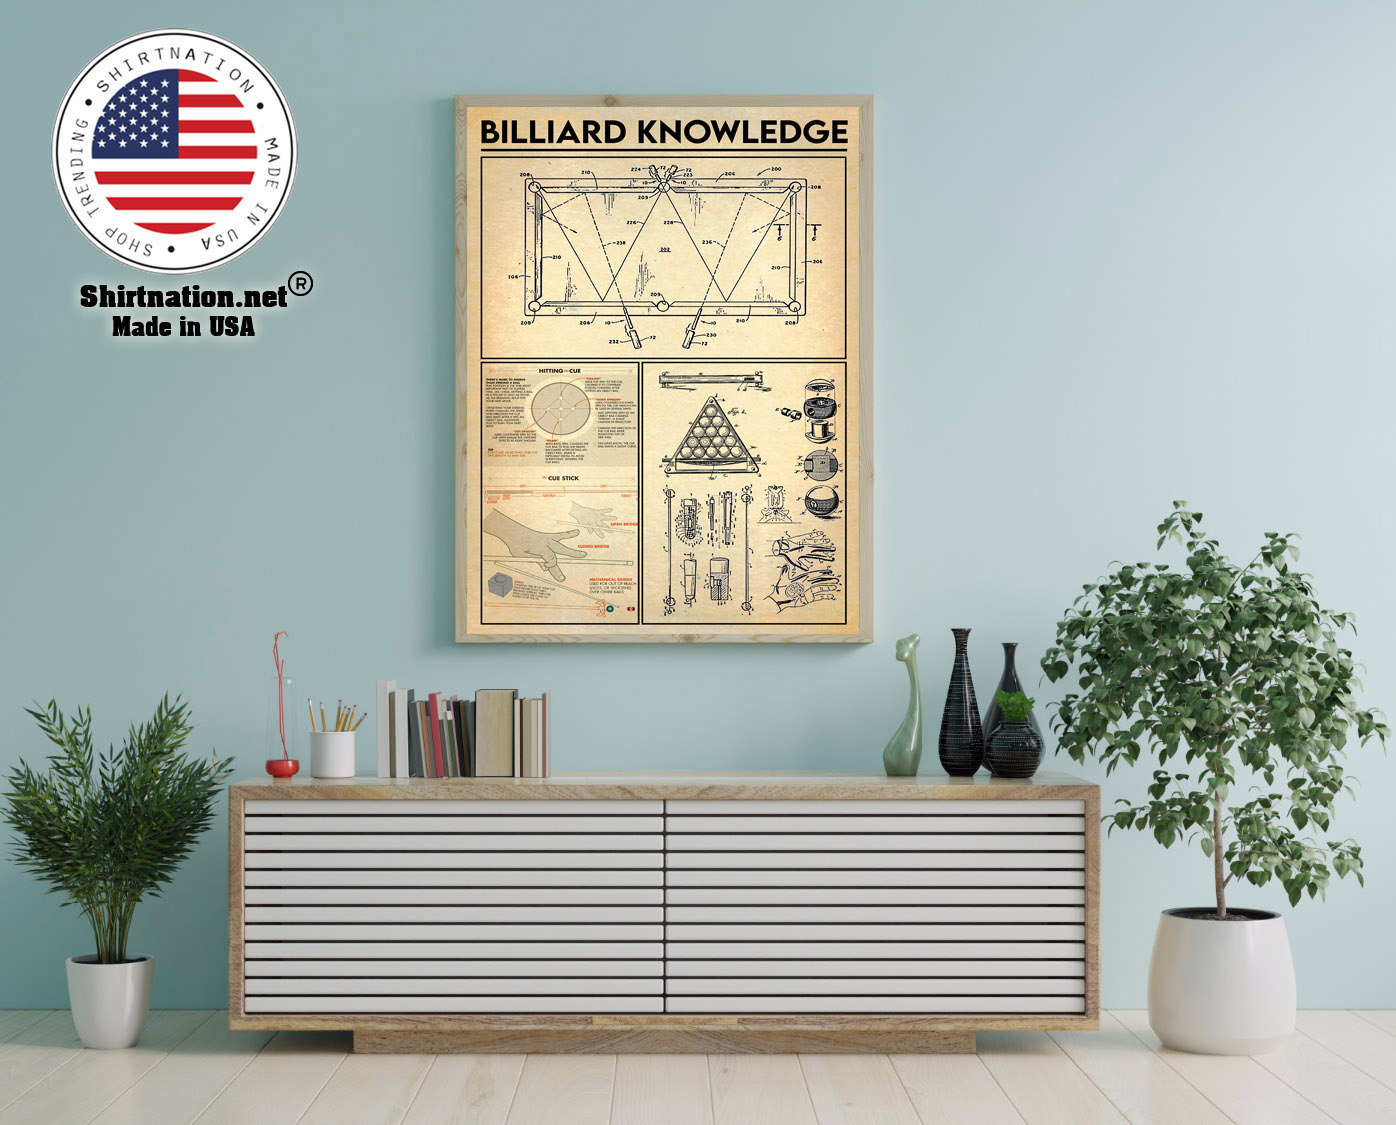 Billiard knowledge poster 12